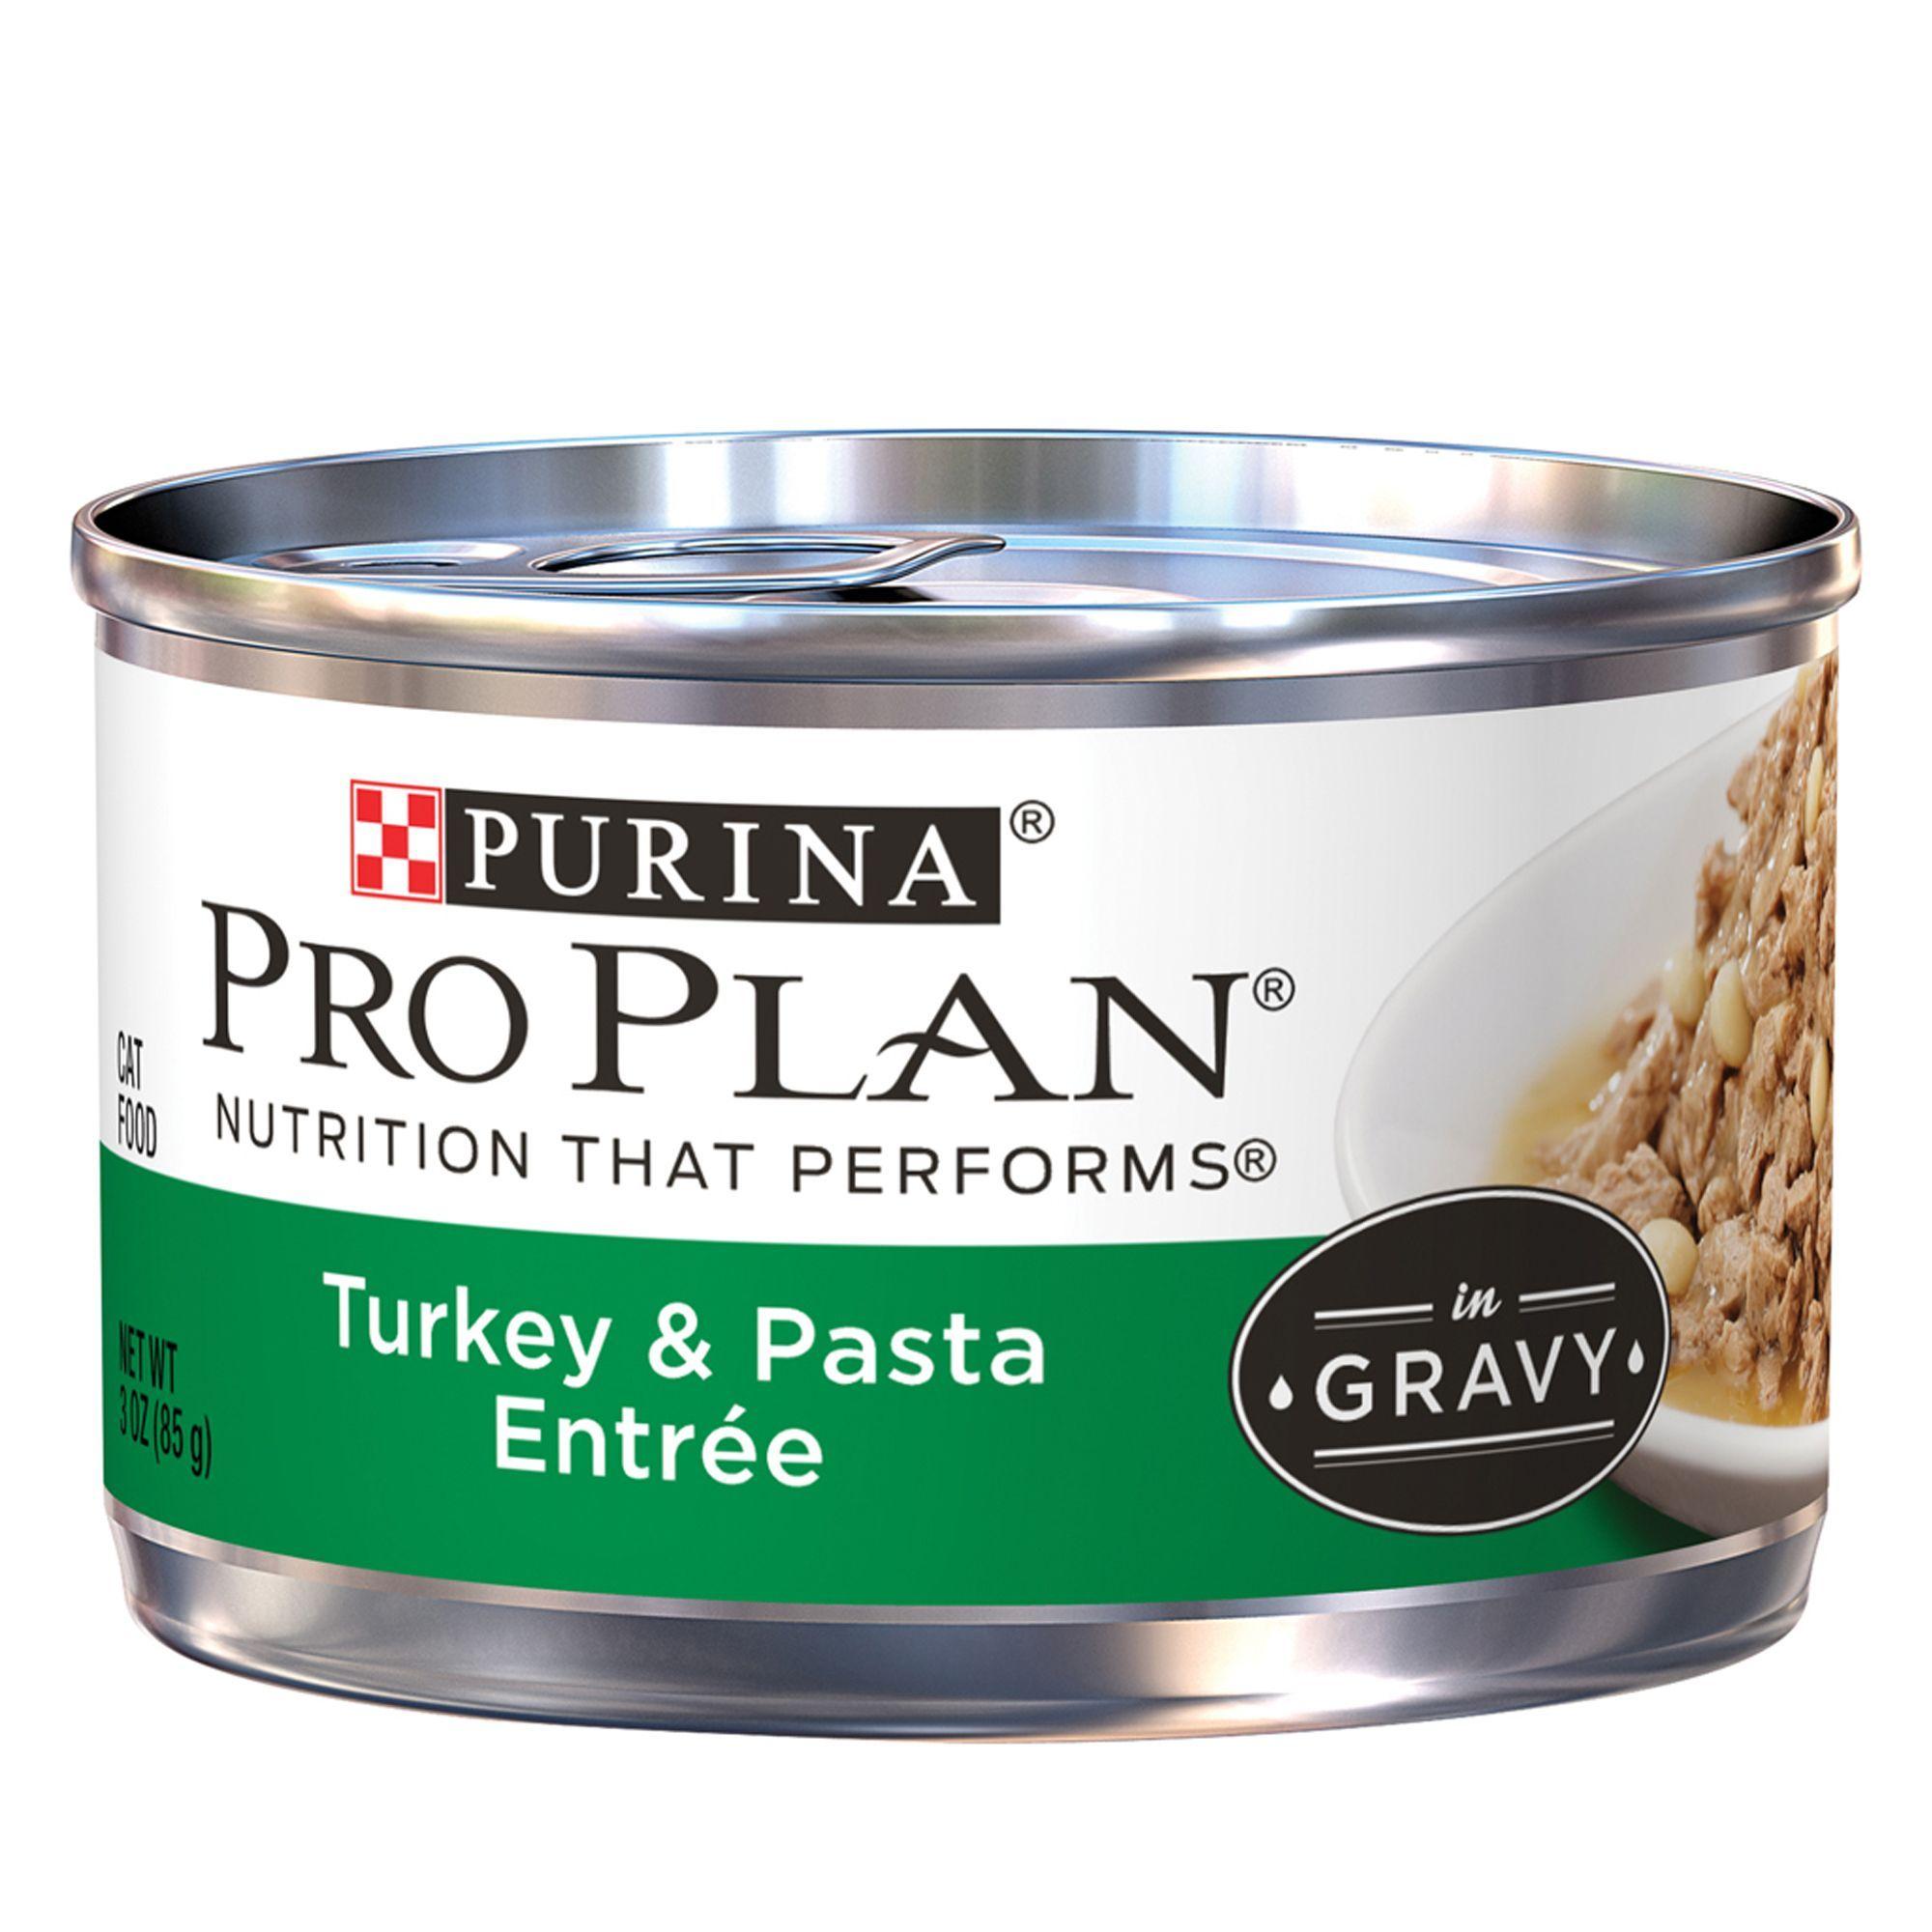 Purina pro plan adult cat food size 3 oz ashcopperzinc